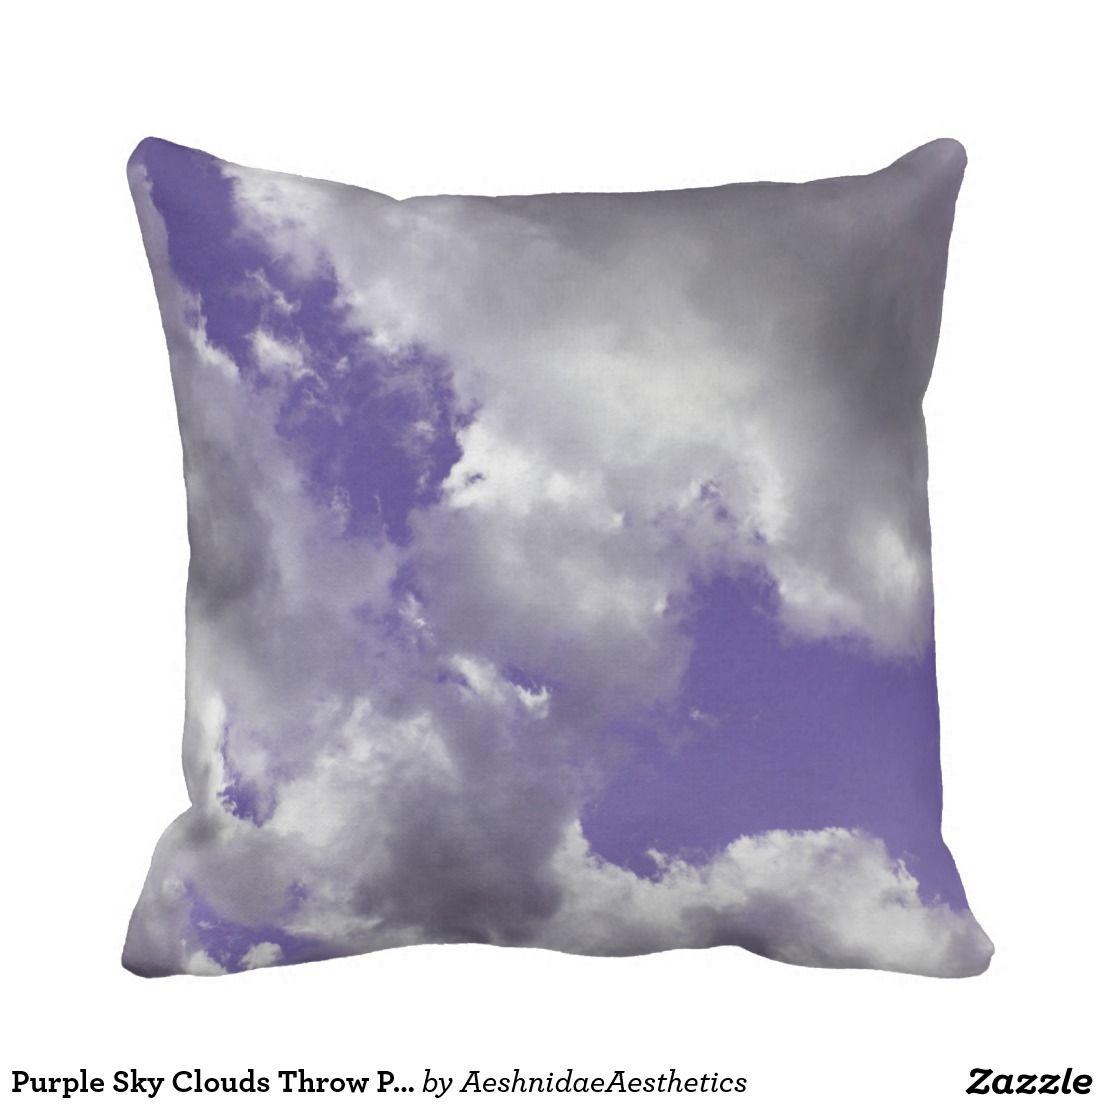 Purple Sky Clouds Throw Pillow Zazzle Com Throw Pillows Purple Throw Pillows Purple Sky